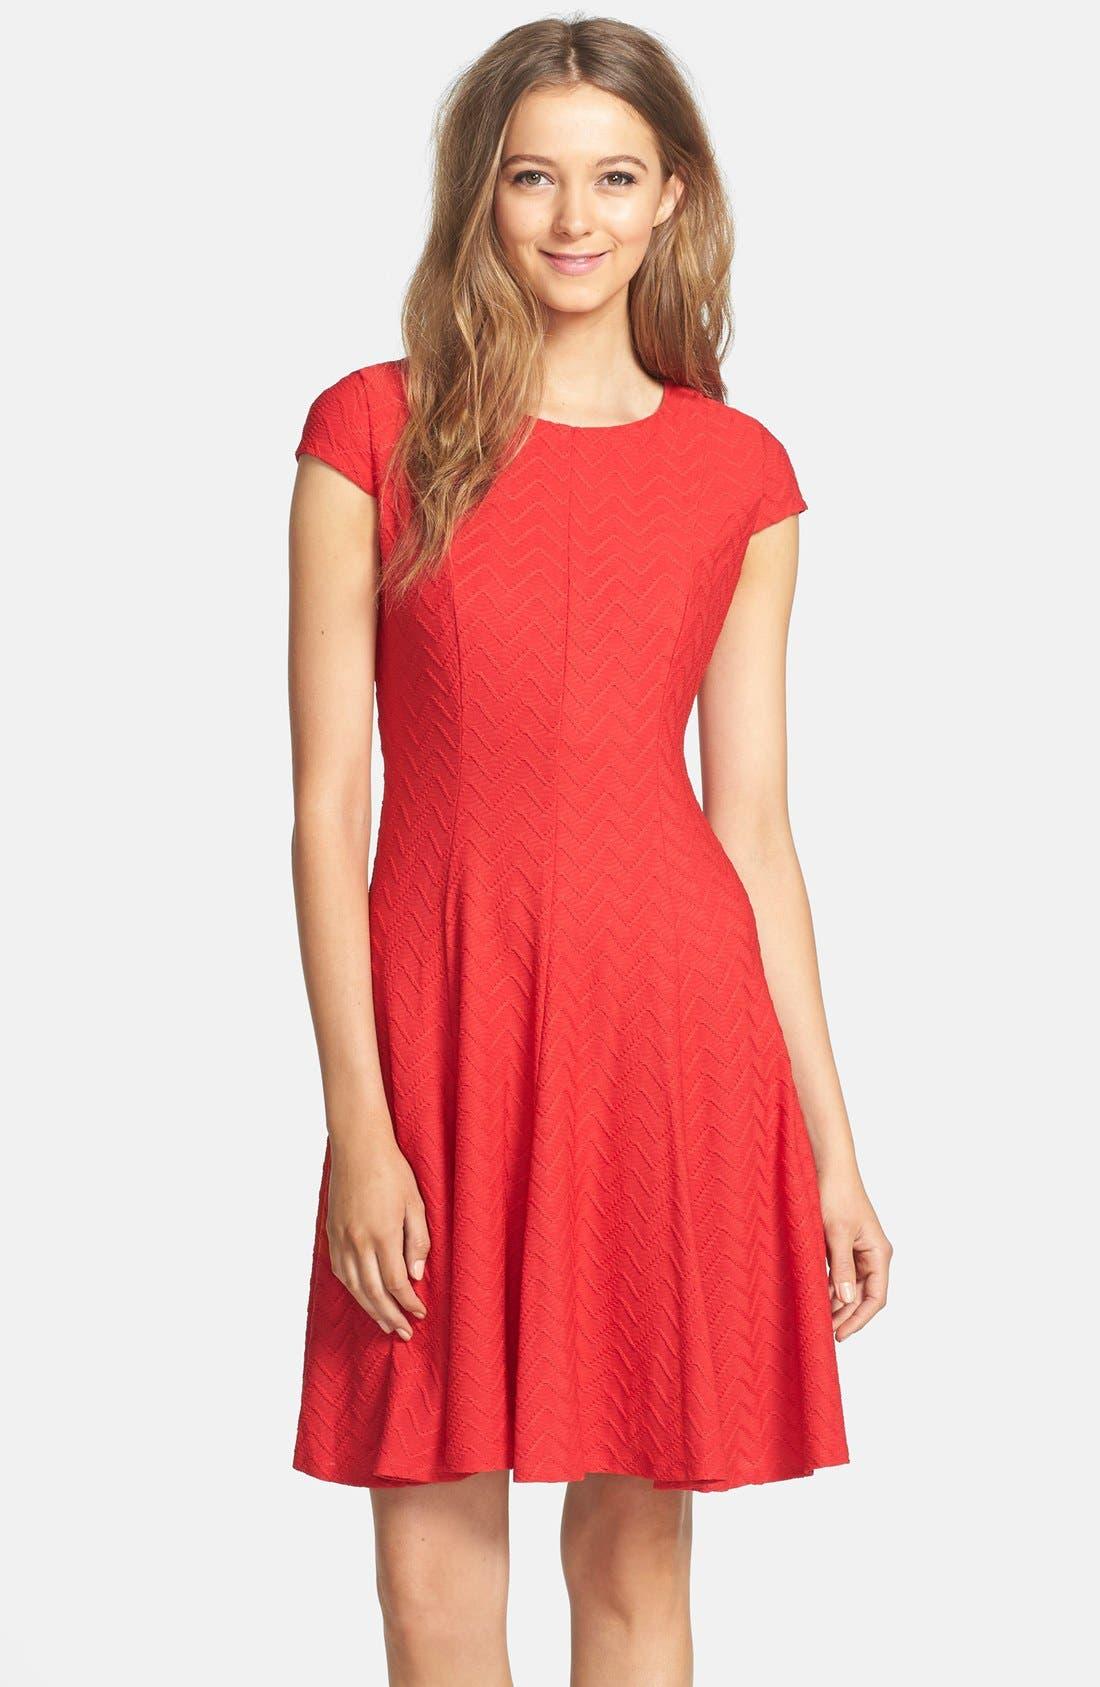 Alternate Image 1 Selected - Eliza J Textured Knit Fit & Flare Dress (Petite)